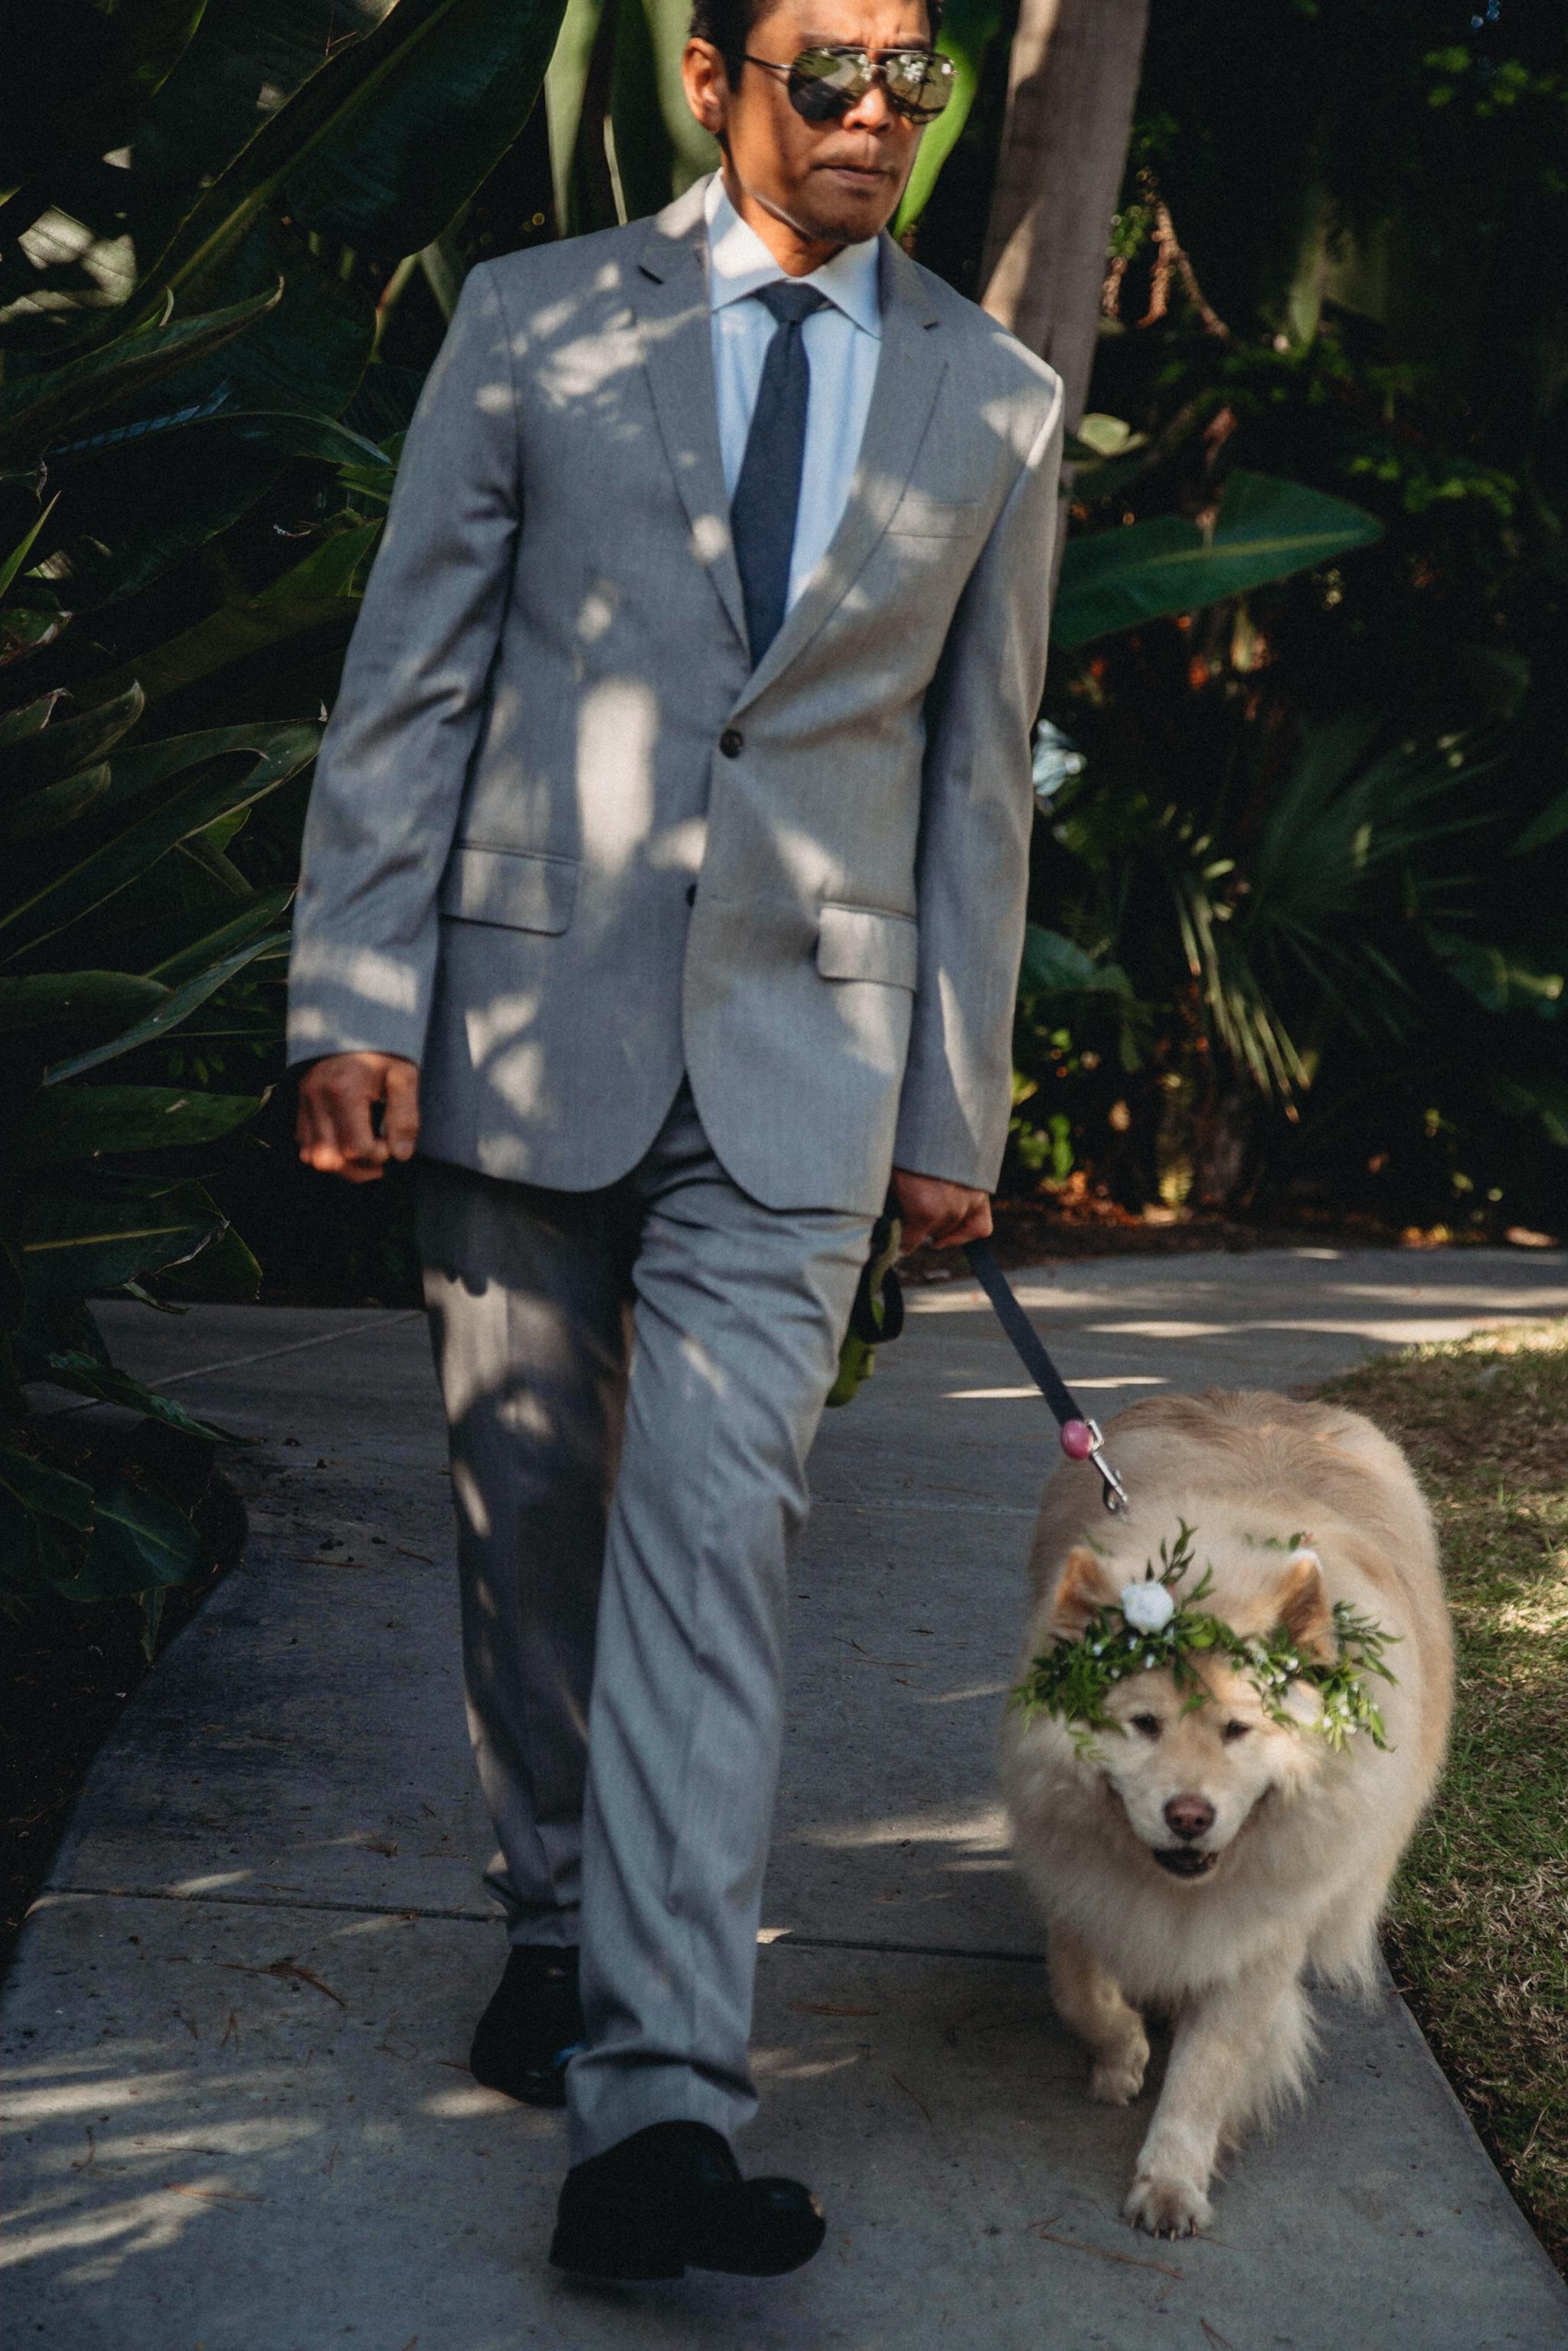 rebeccaylasotras-sandiego-lgbt-wedding-photography-35.jpg